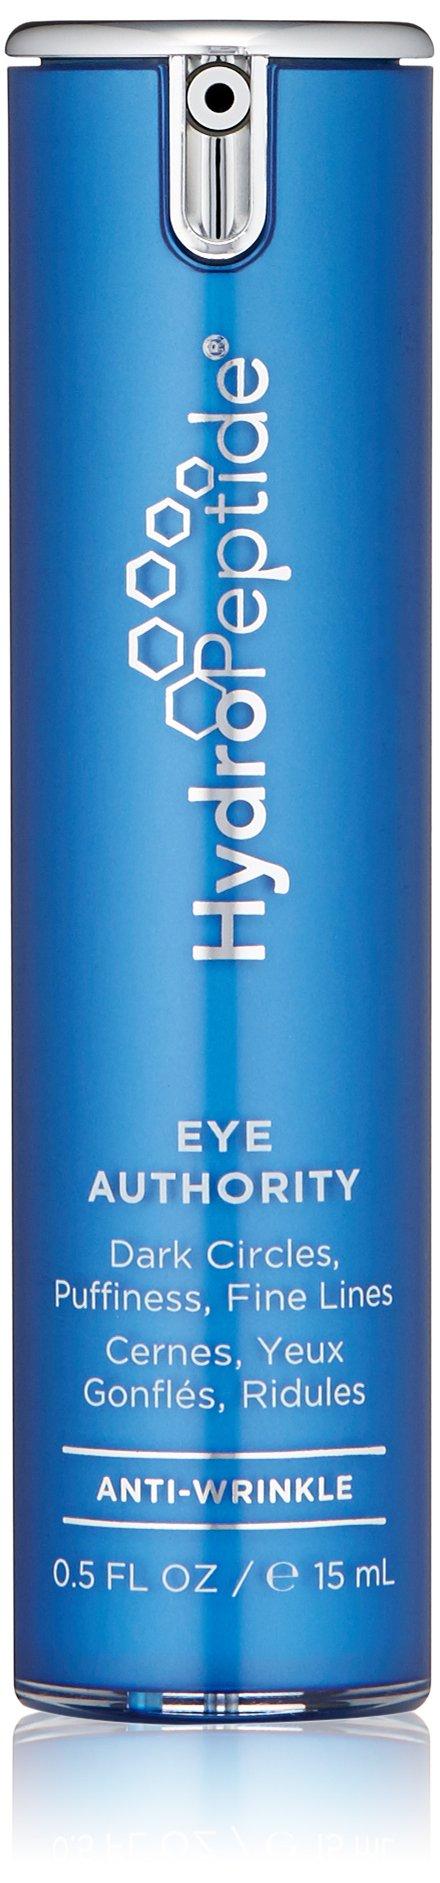 Eye Authority Dark Circles, Puffiness & Fine Line Eliminator.5 oz